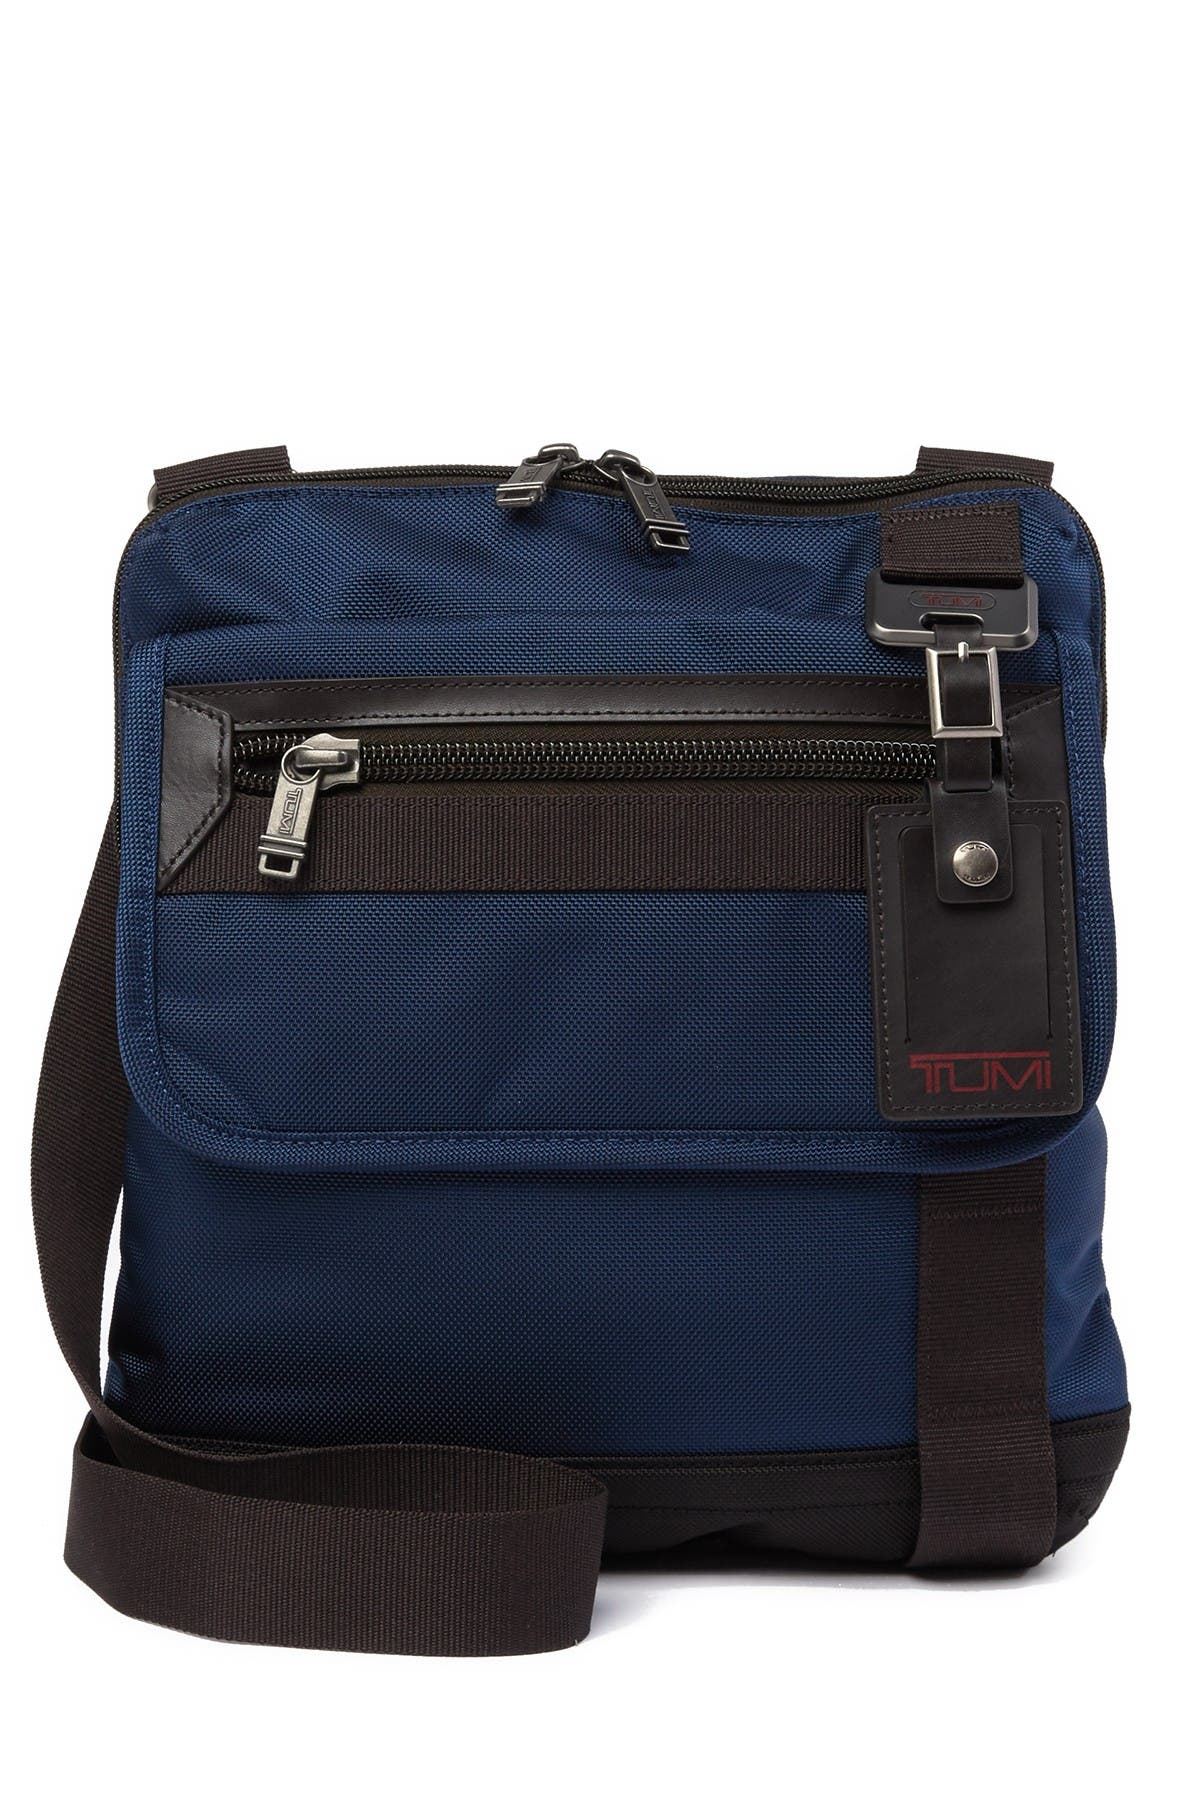 Image of Tumi Eastern Flap Crossbody Bag